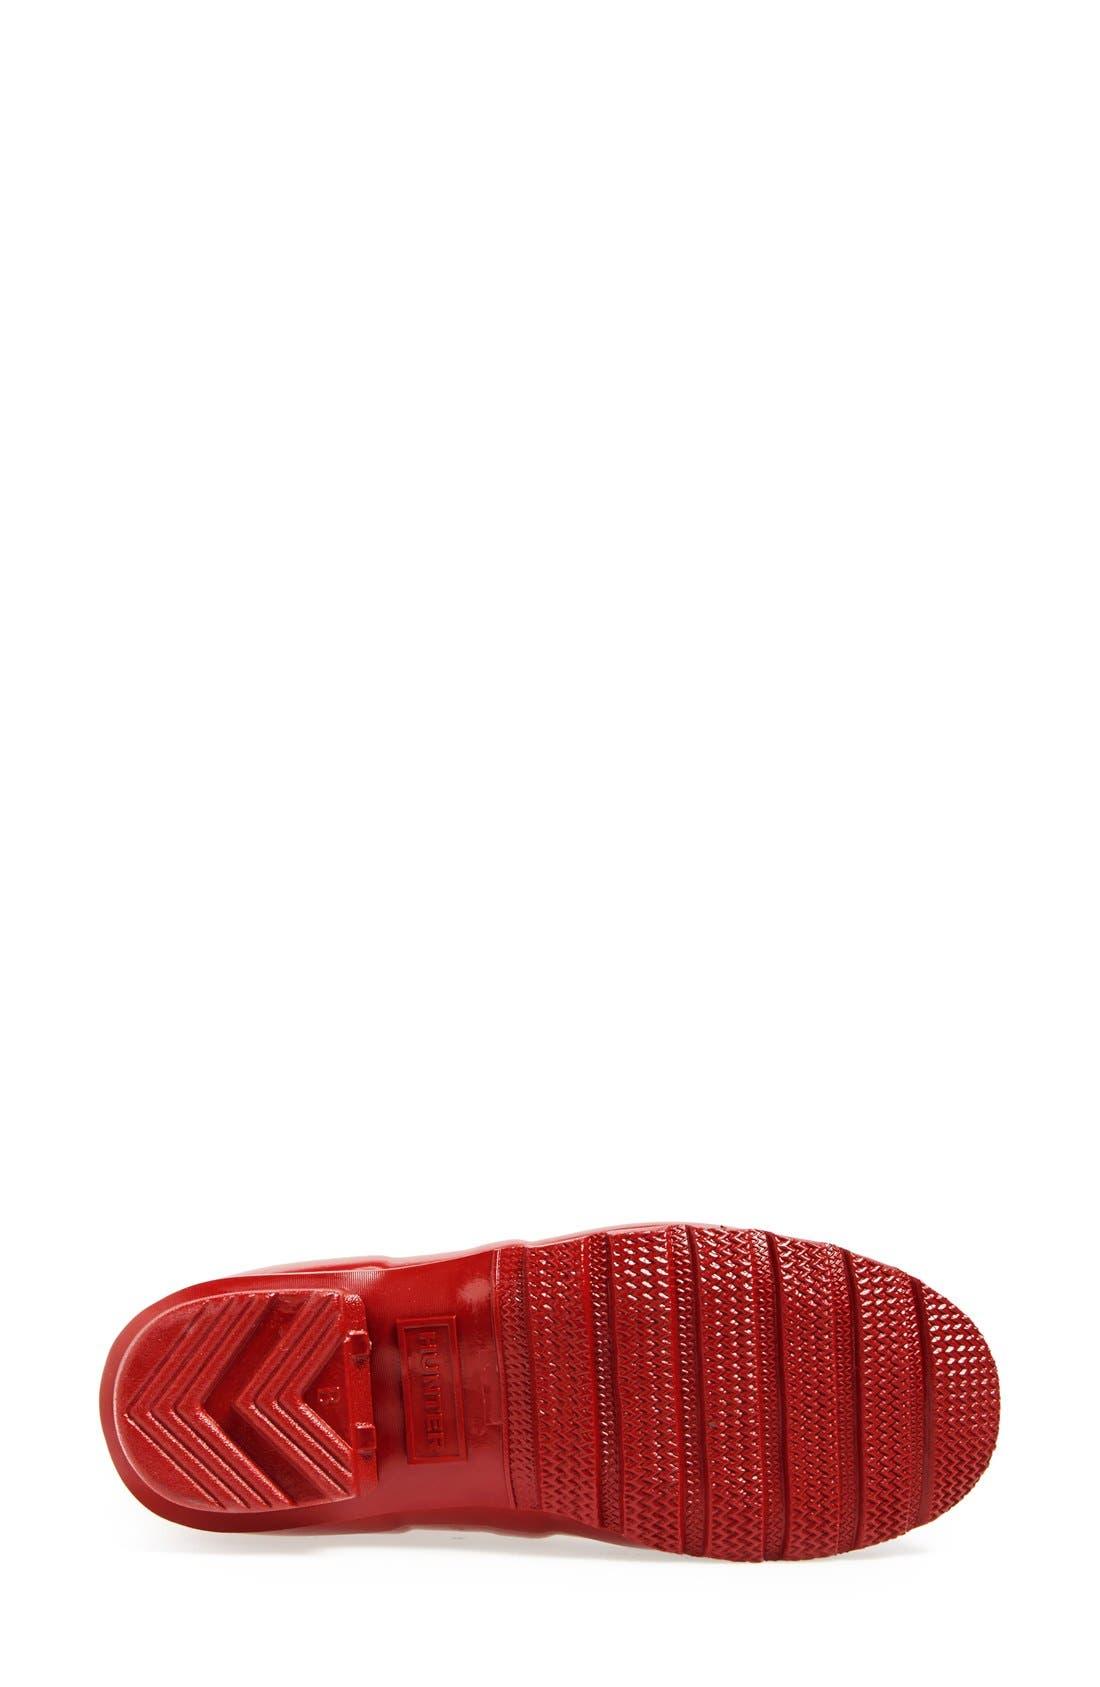 HUNTER, Original High Gloss Waterproof Boot, Alternate thumbnail 4, color, MILITARY RED